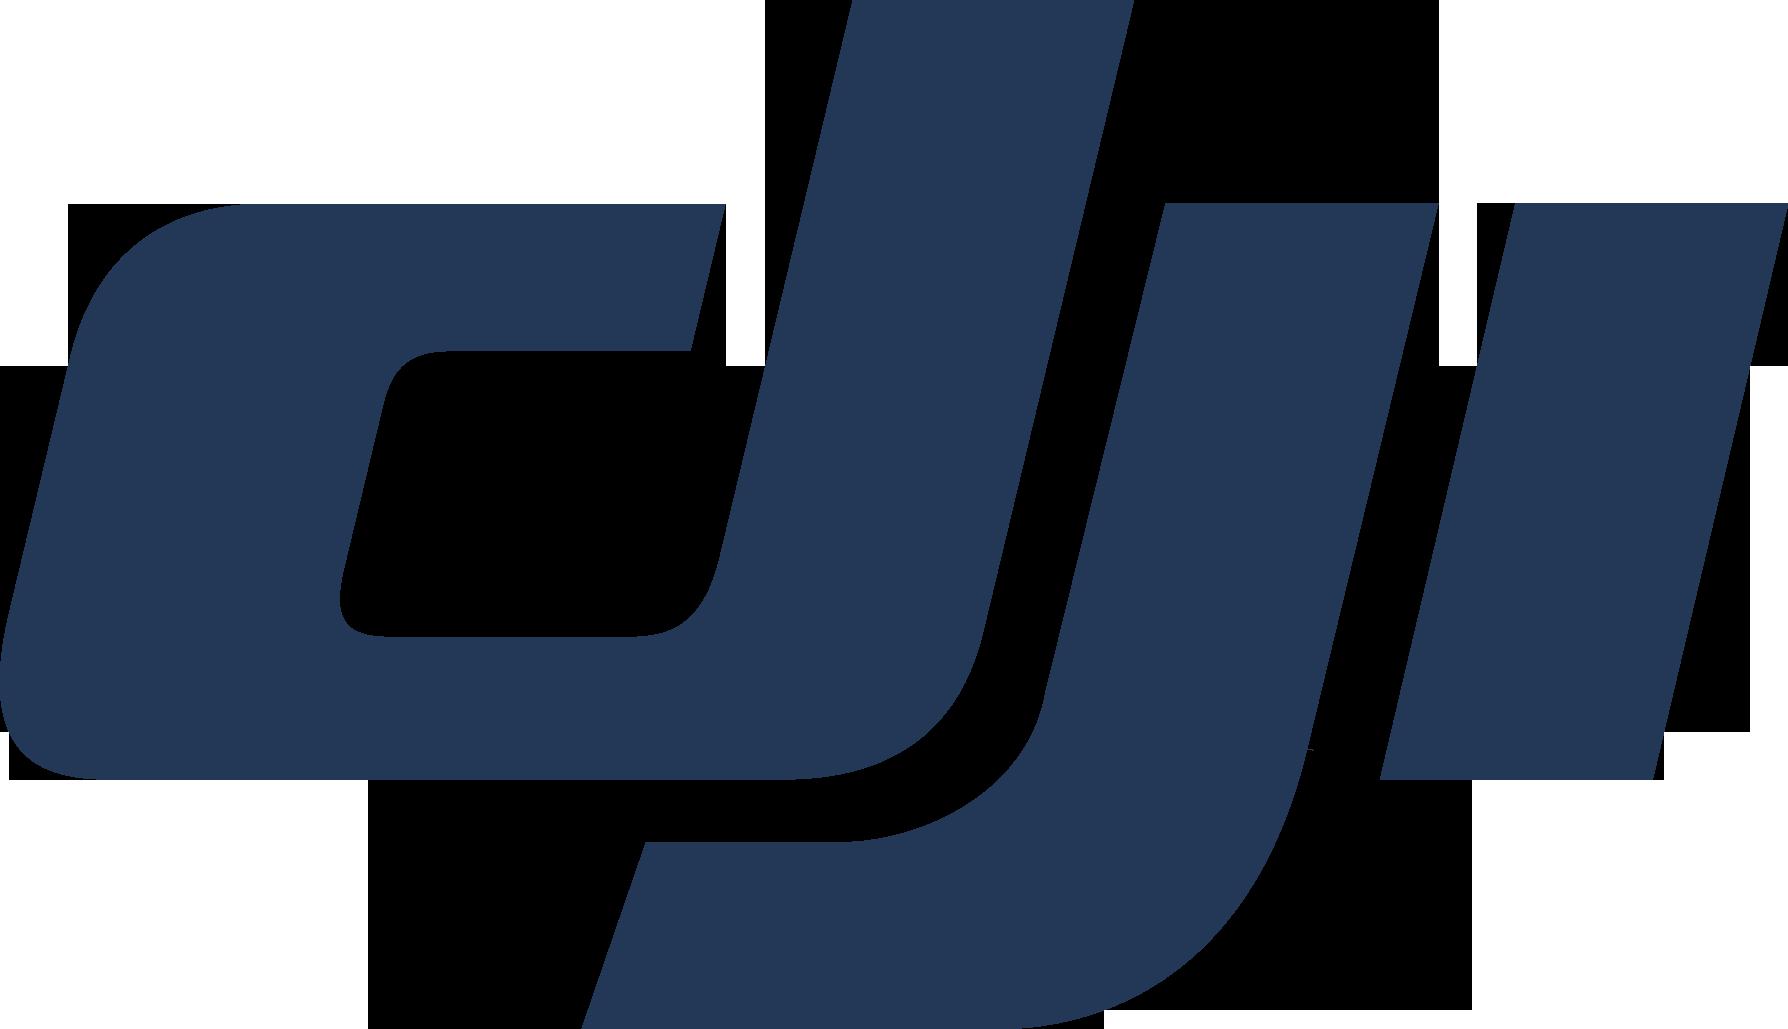 DJI Logo PNG Wallpaper